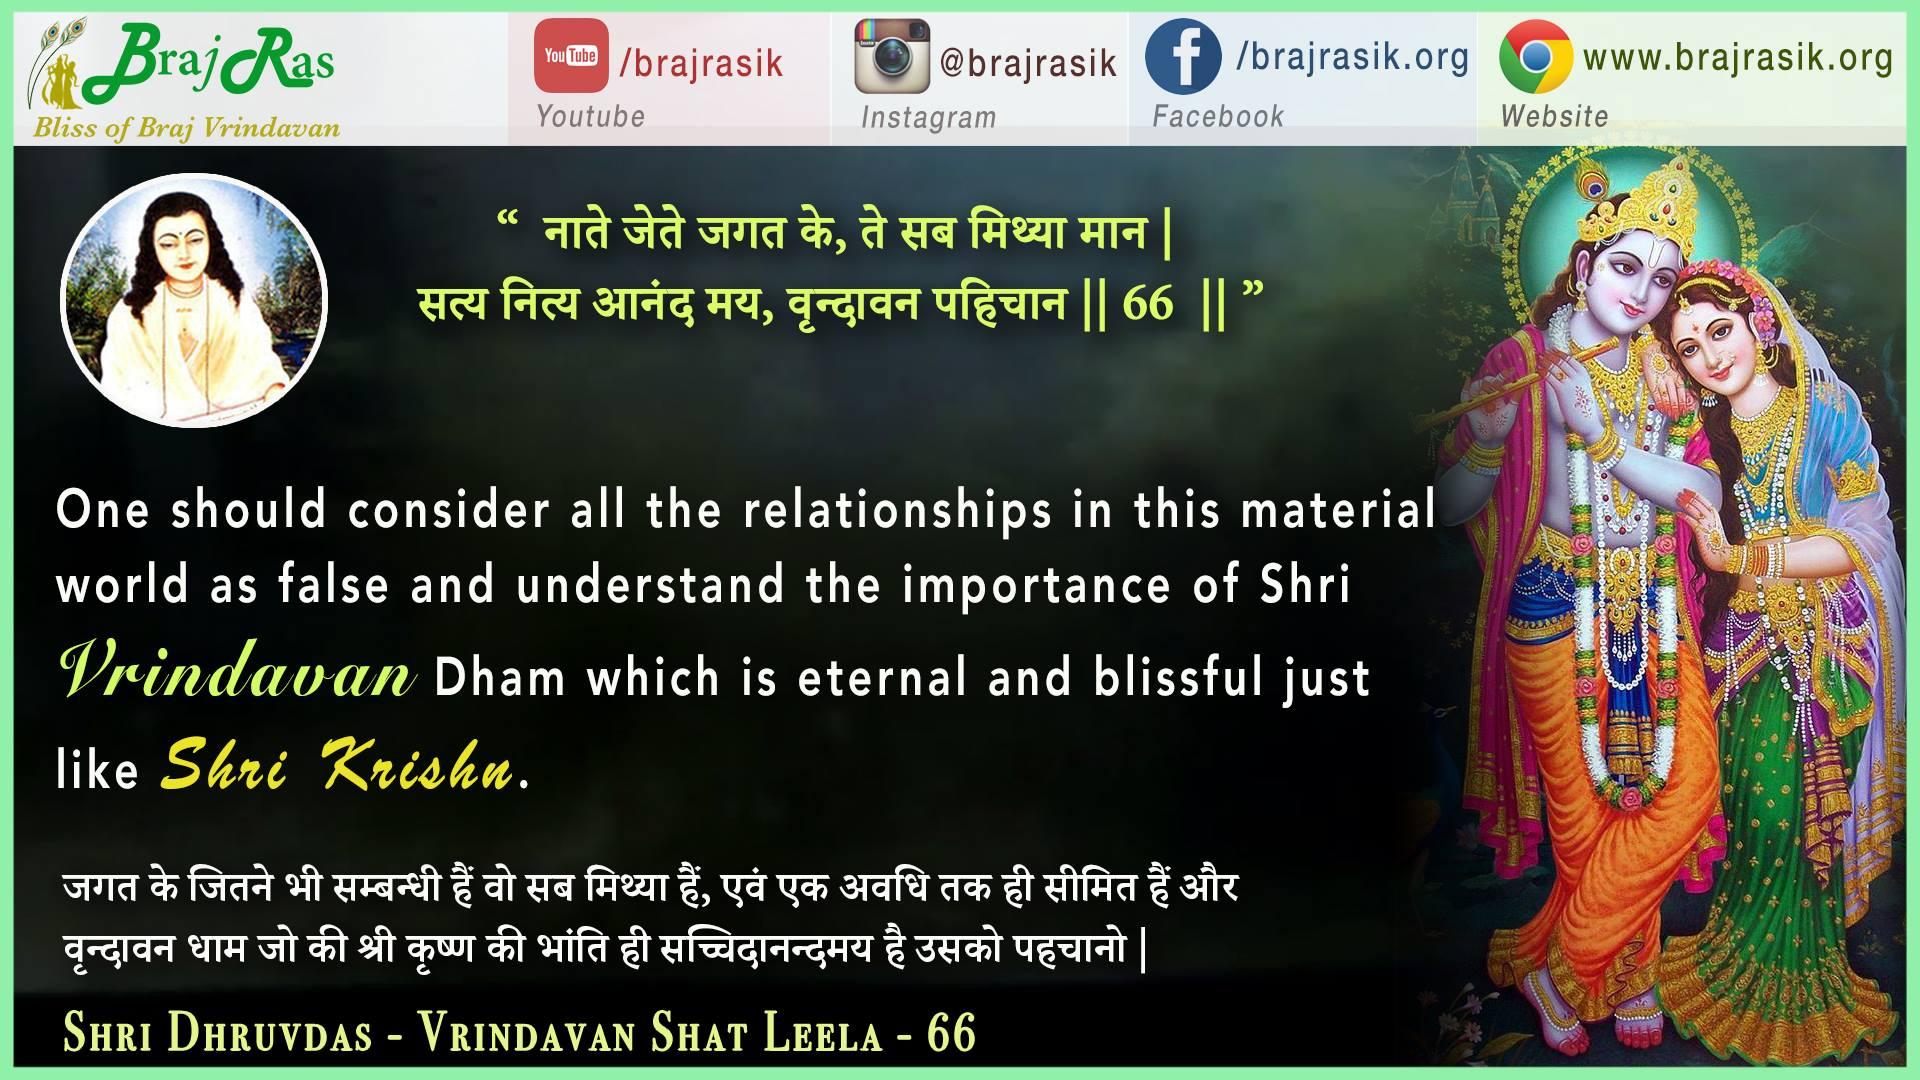 naate jete jagat ke - Shri Dhruvdas - Vrindavan Shat Leela